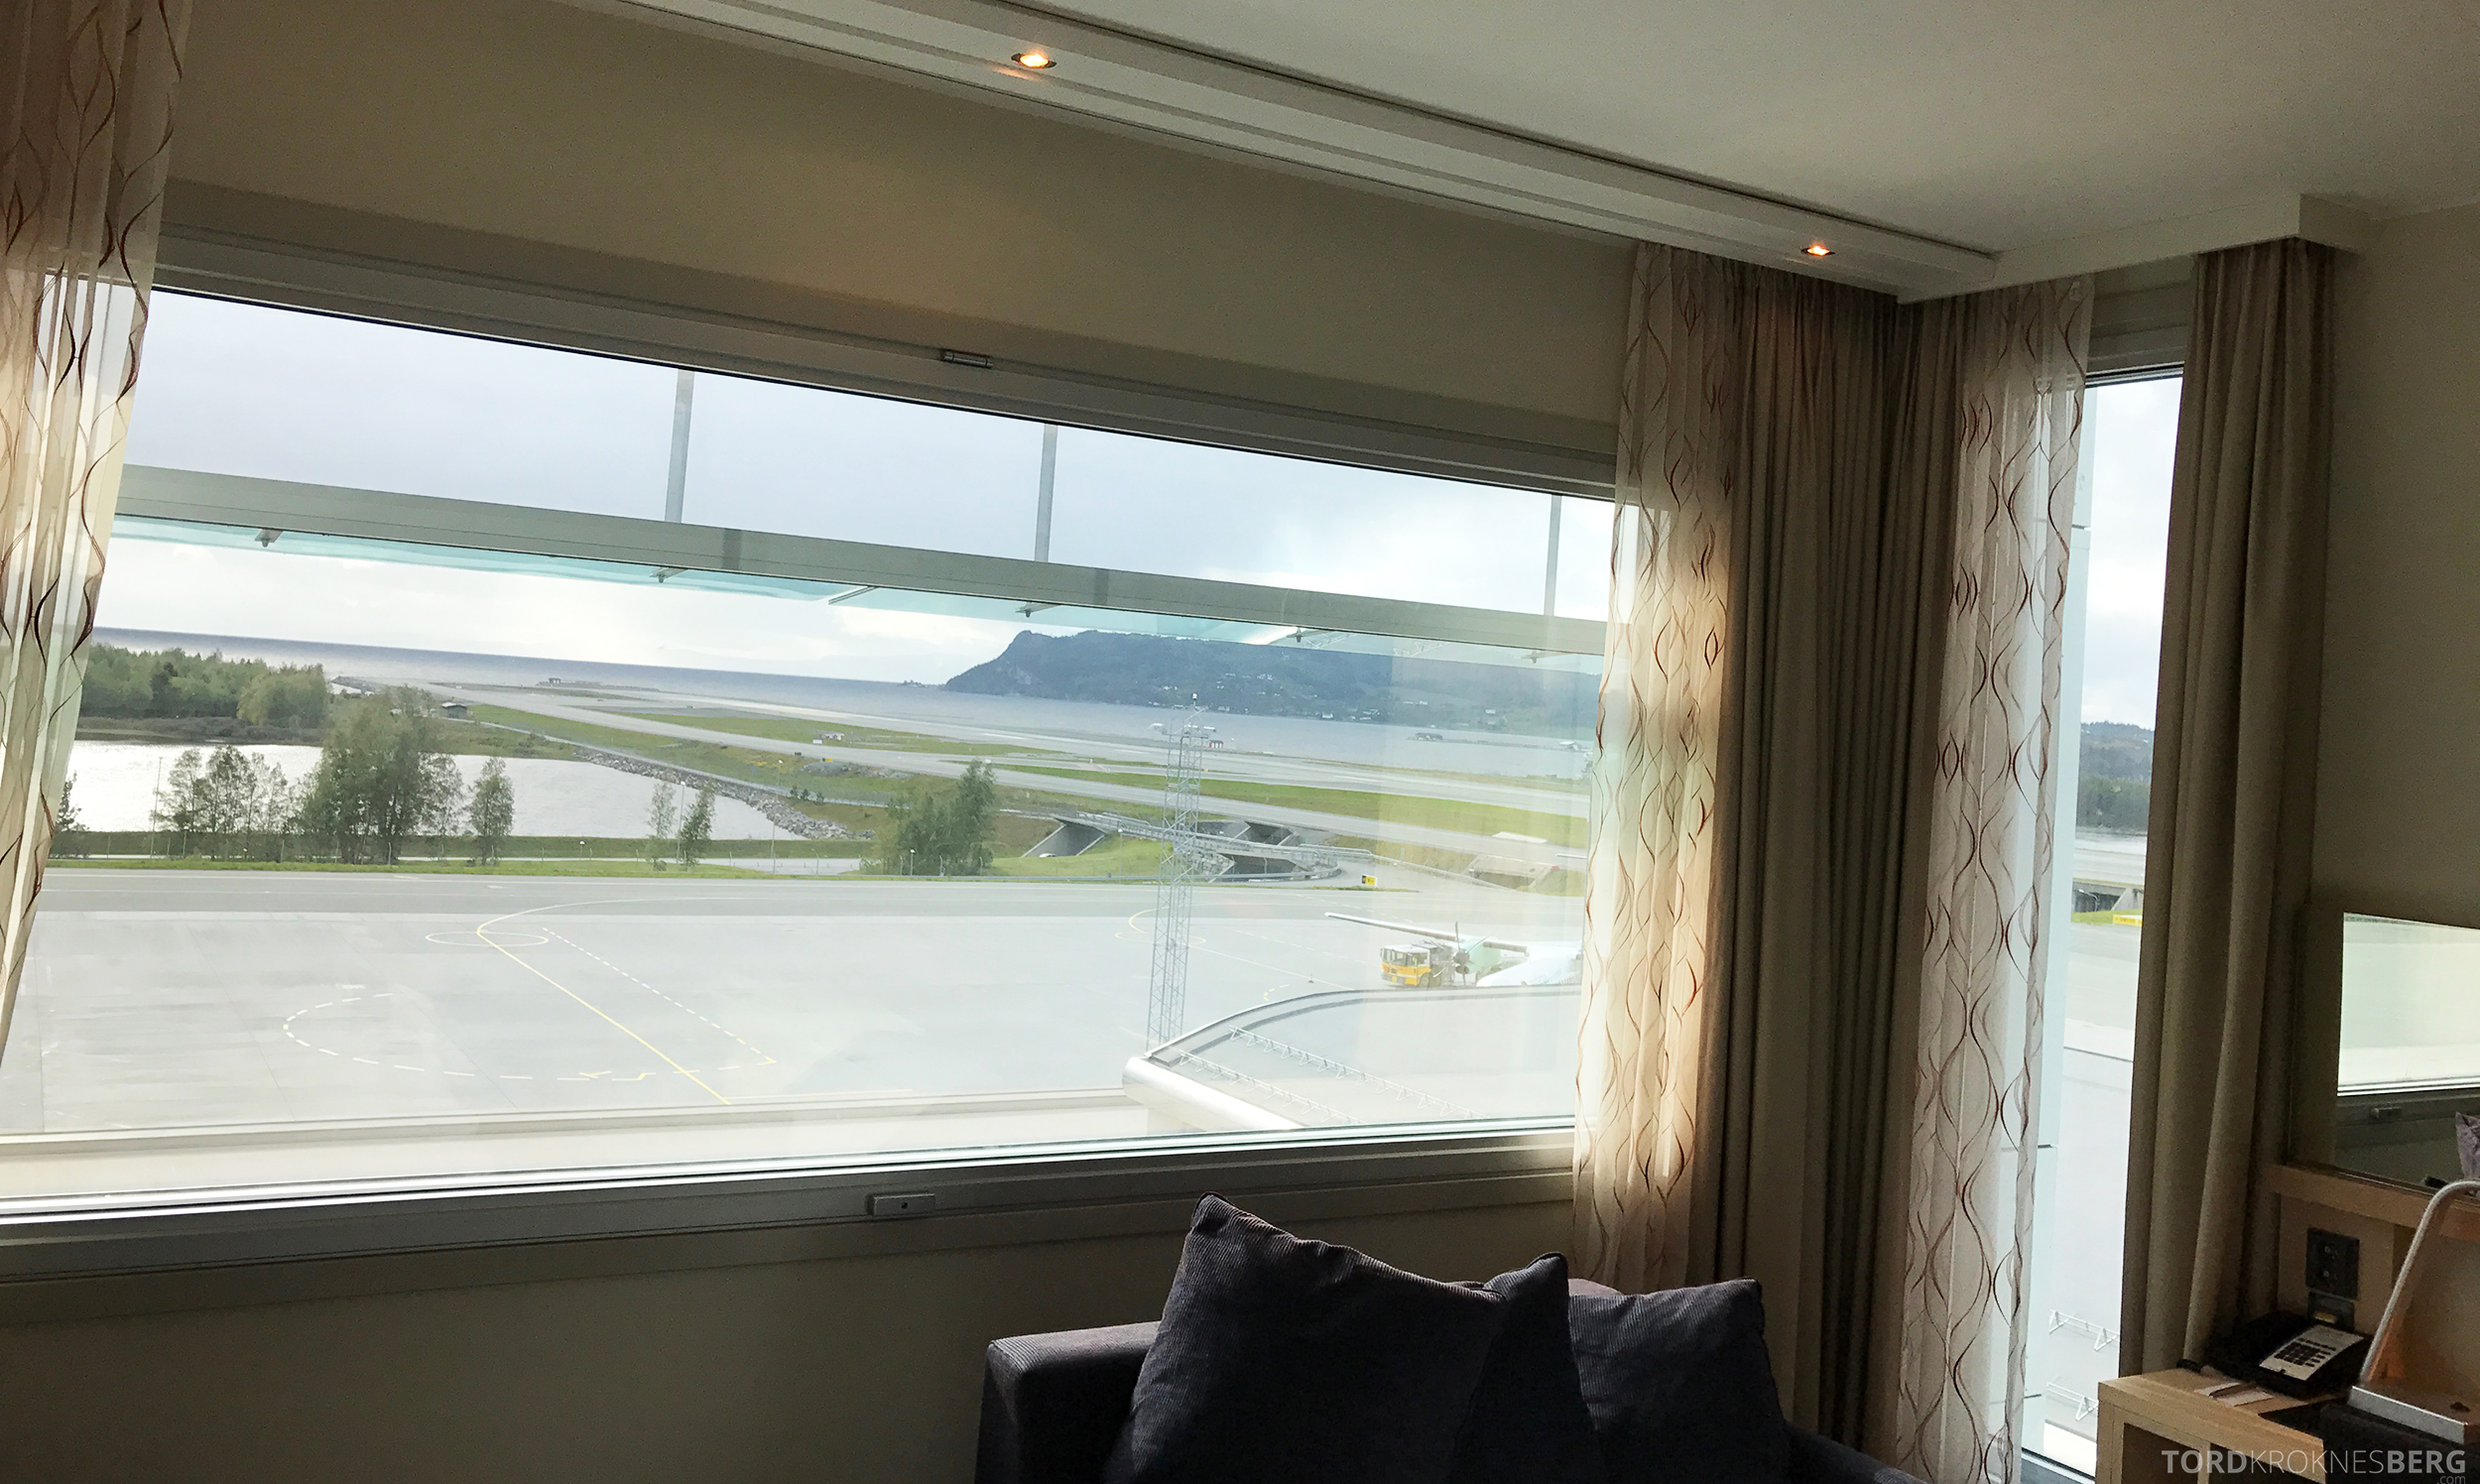 Radisson Blu Airport Værnes panorama